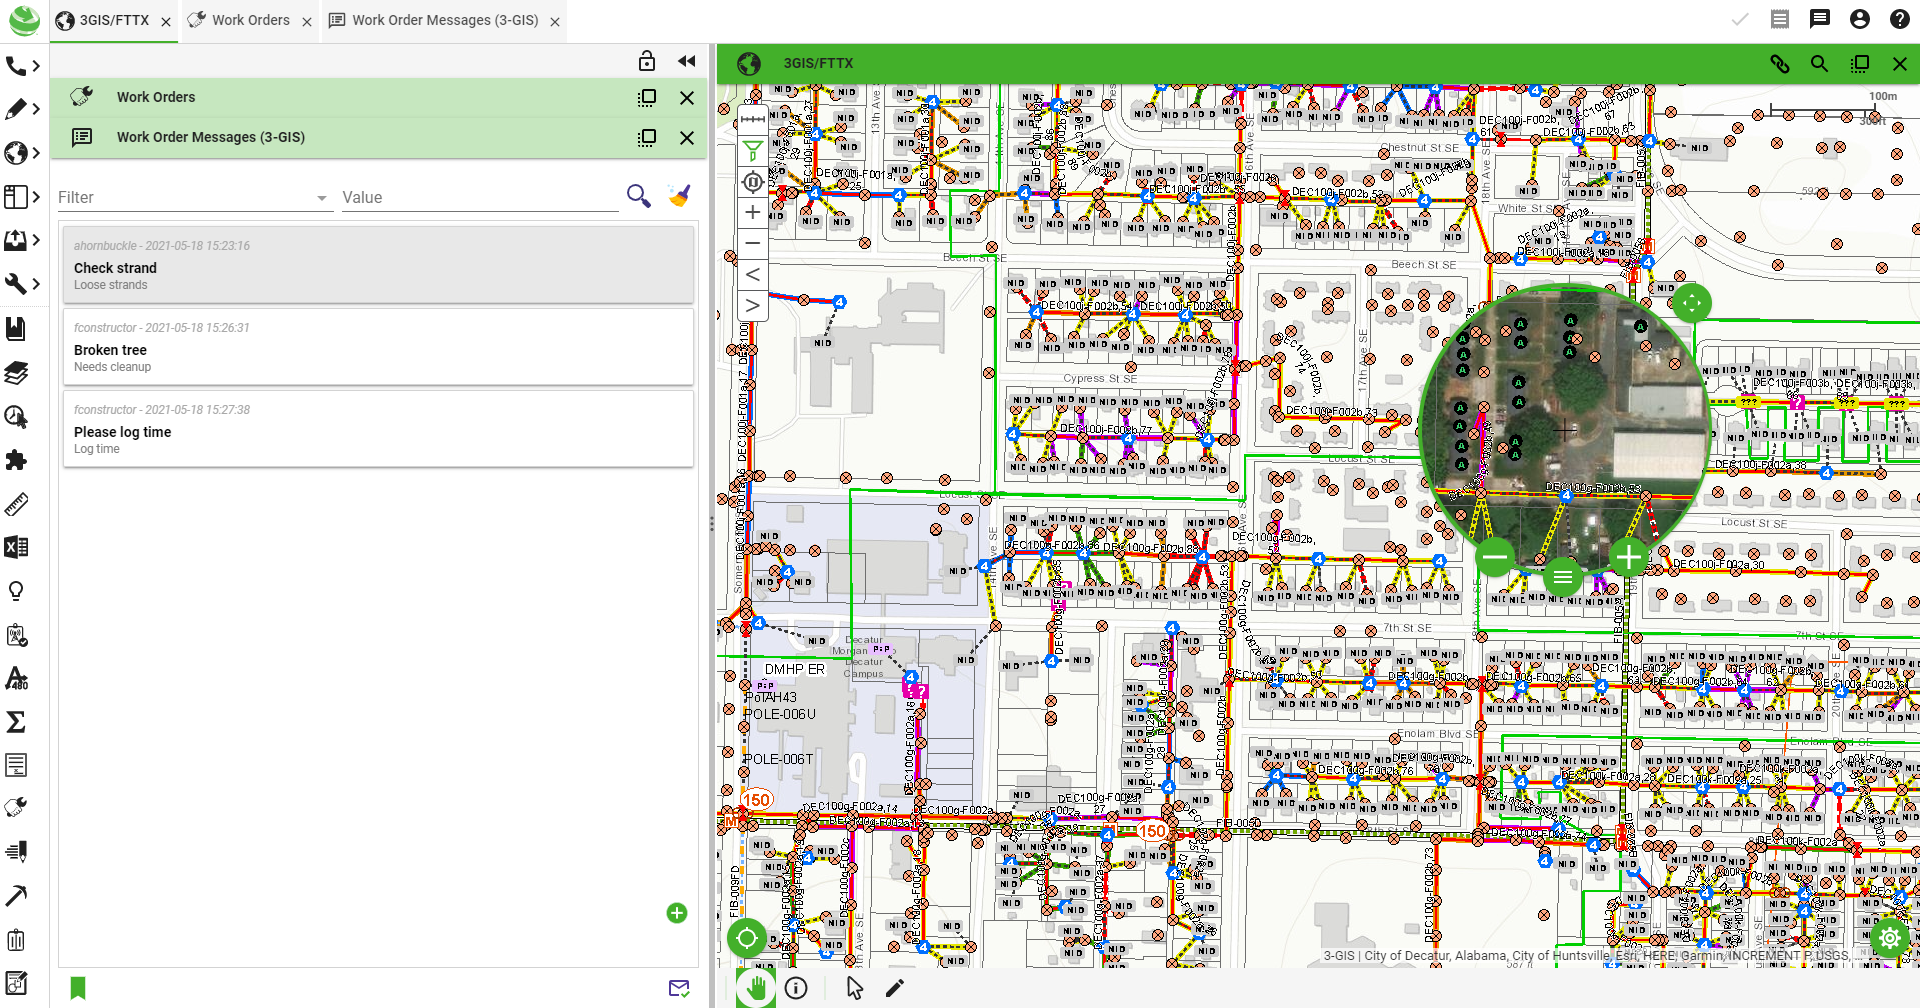 210628_Img_Web_G3_WorkOrderMessaging_MapMagnifier